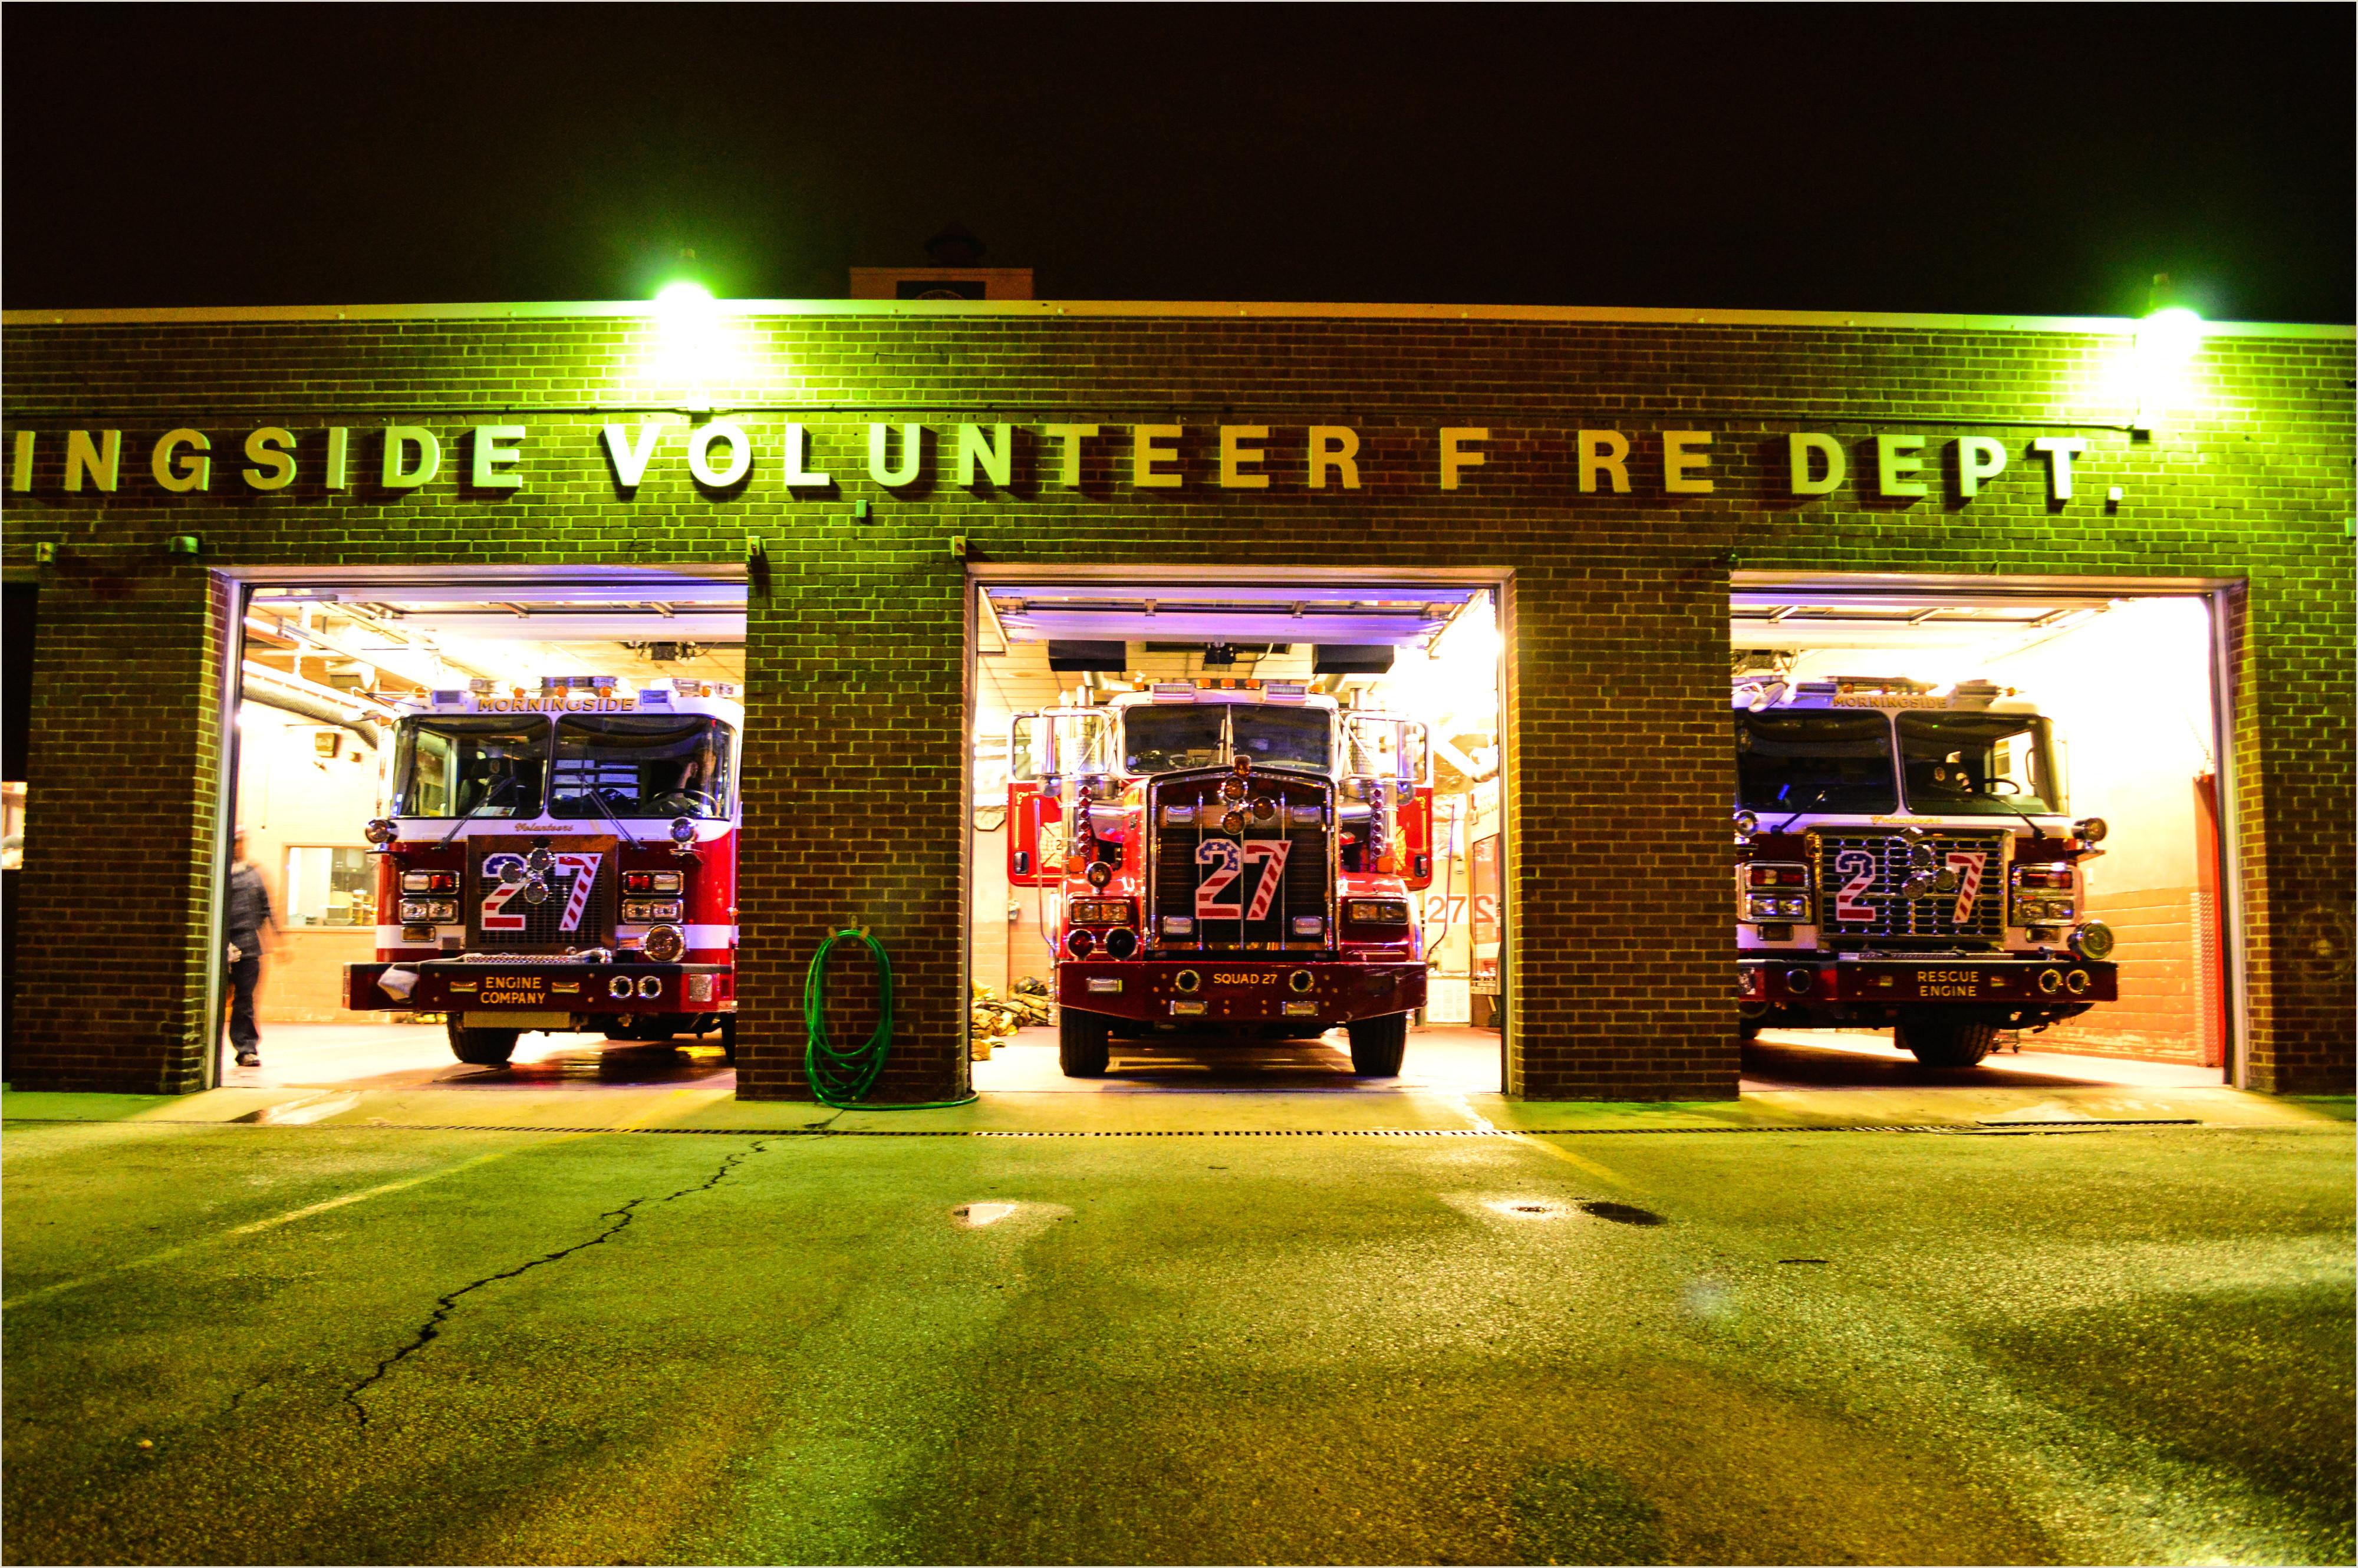 Morningside Volunteer Fire Department Co 27 Fire Rescue